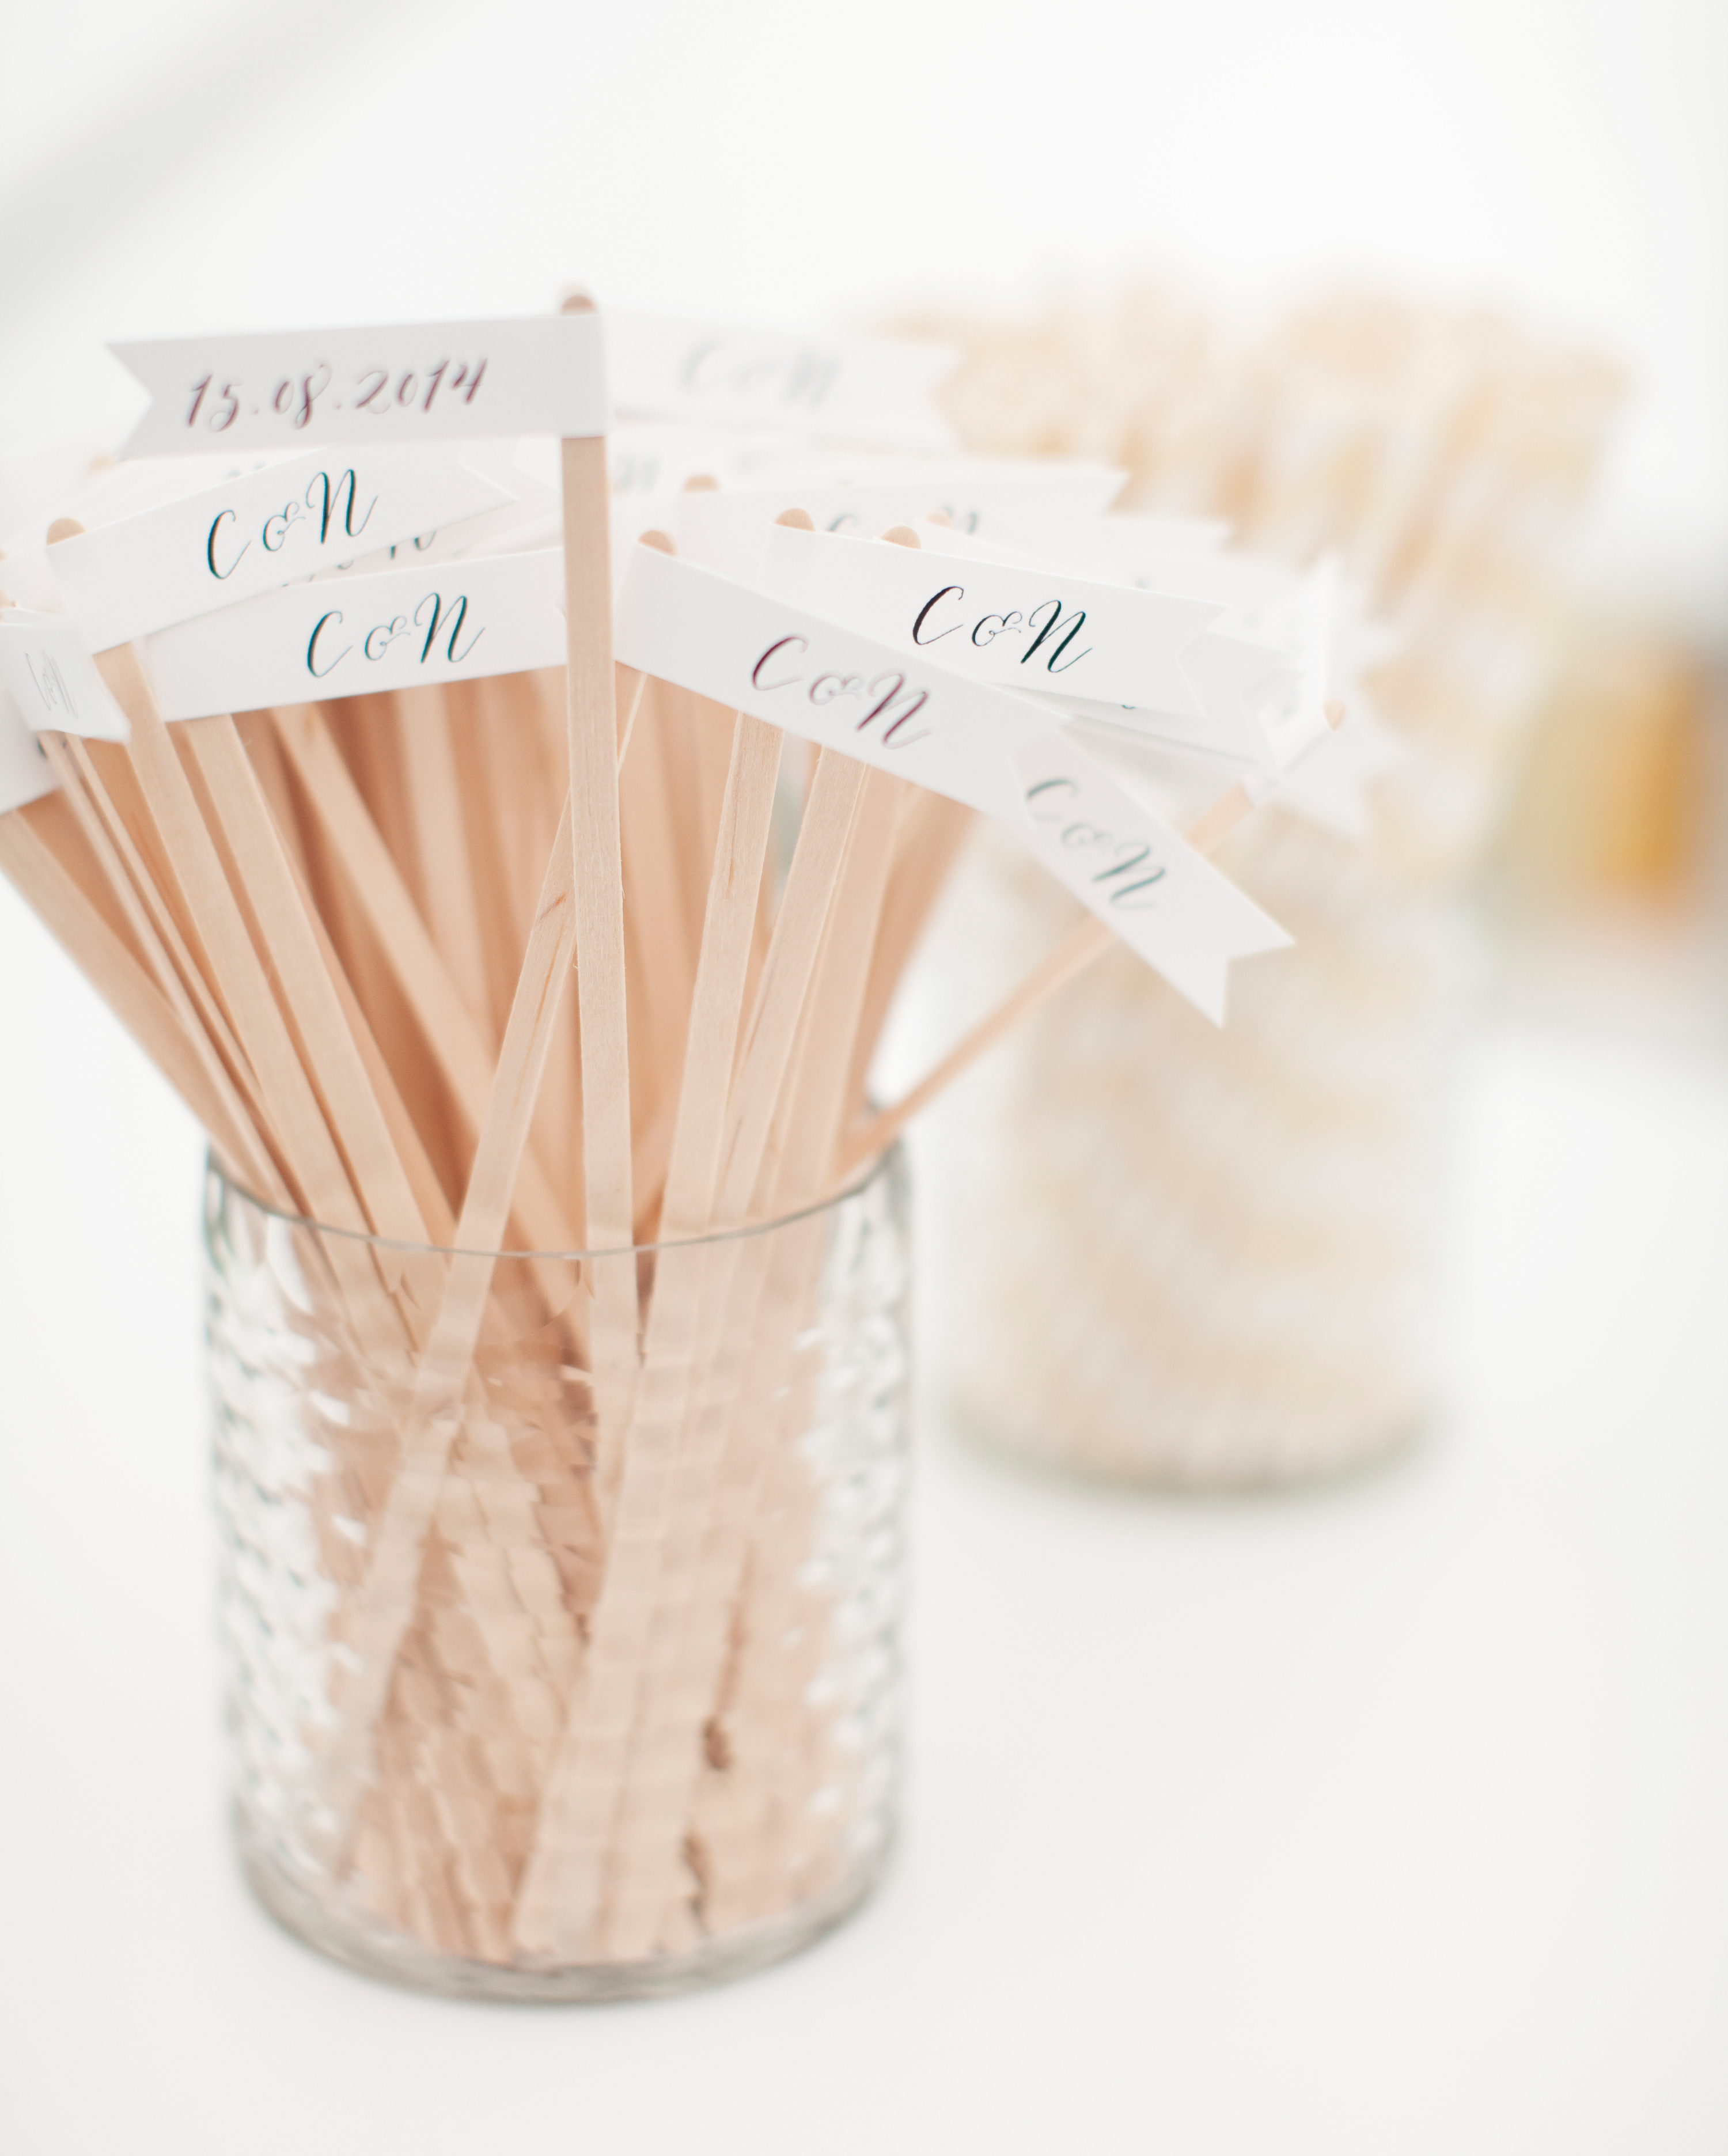 negin-chris-wedding-stirsticks-0534-s112116-0815.jpg